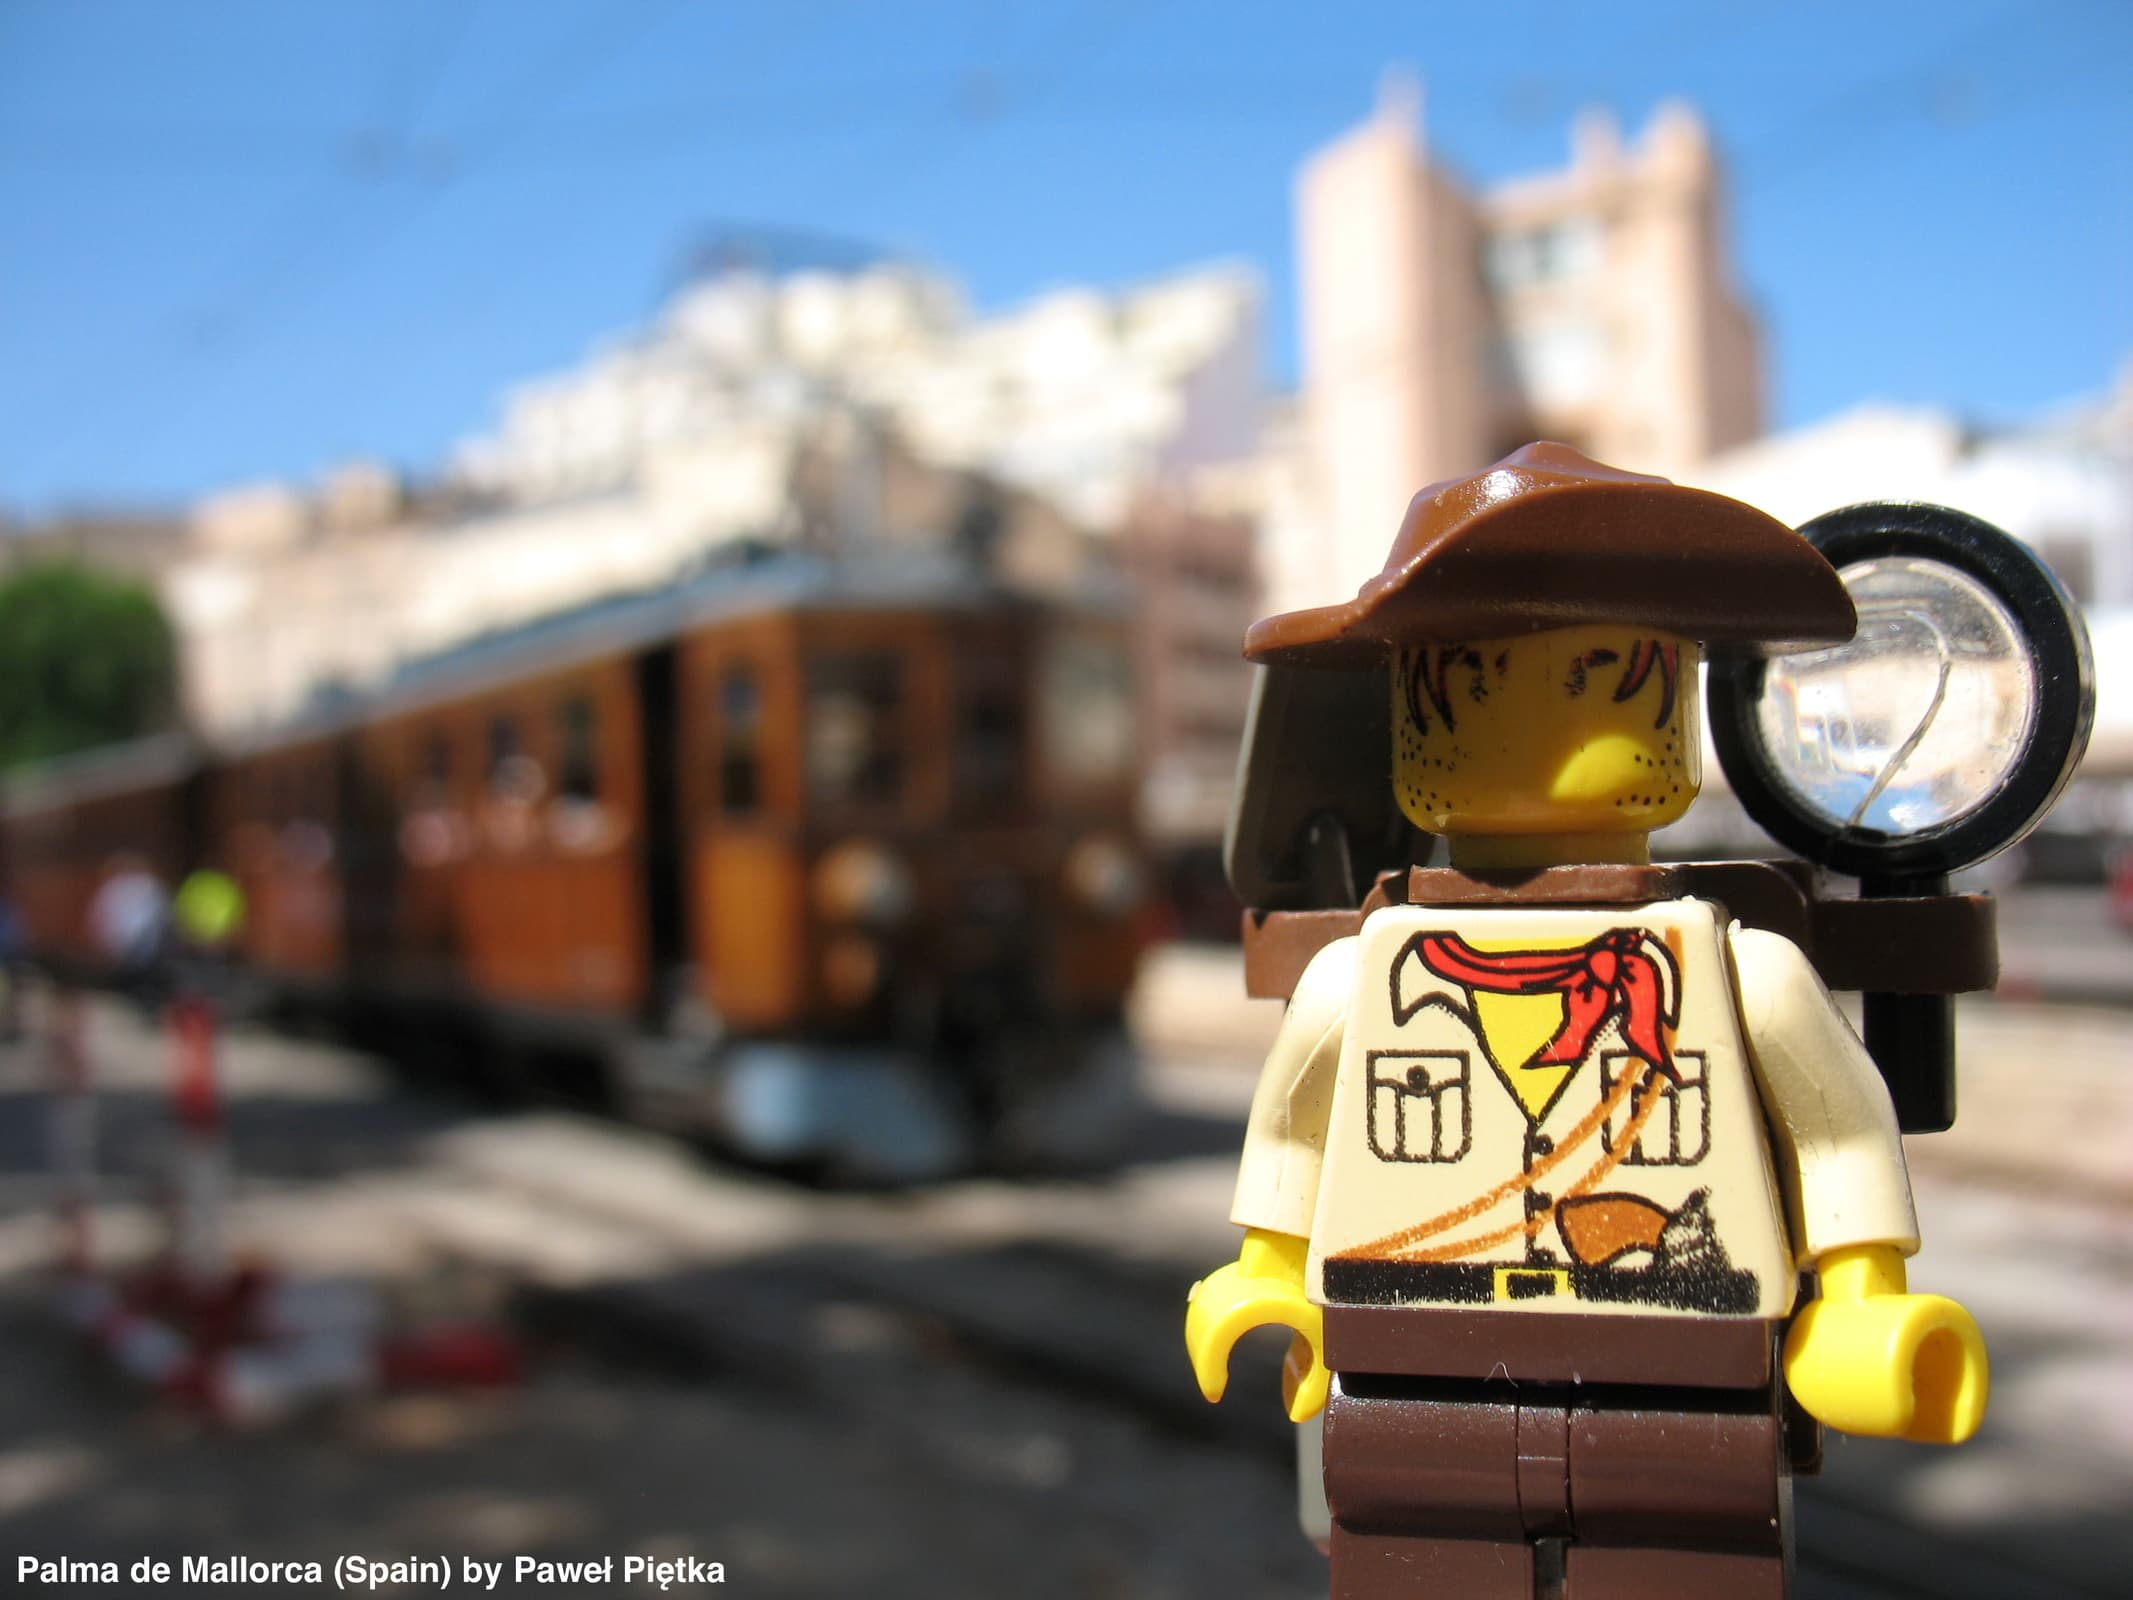 Palma de Mallorca (Spain) - Ferrocarril de Soller